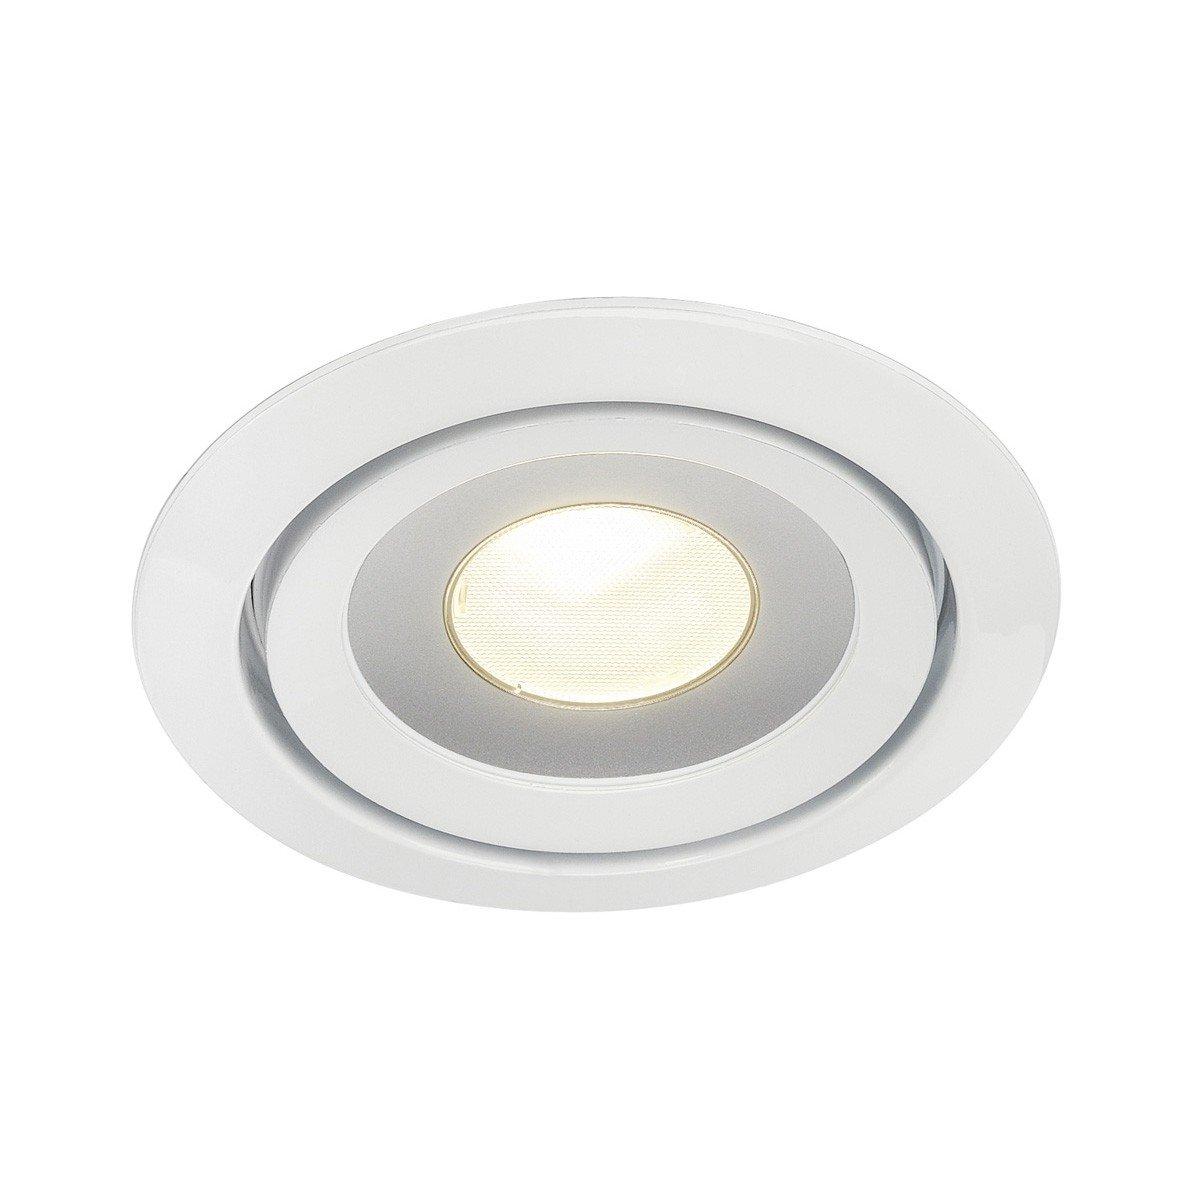 SLV LUZO Leuchte Indoor-Lampe Aluminium Weiß Lampe innen, Innen-Lampe